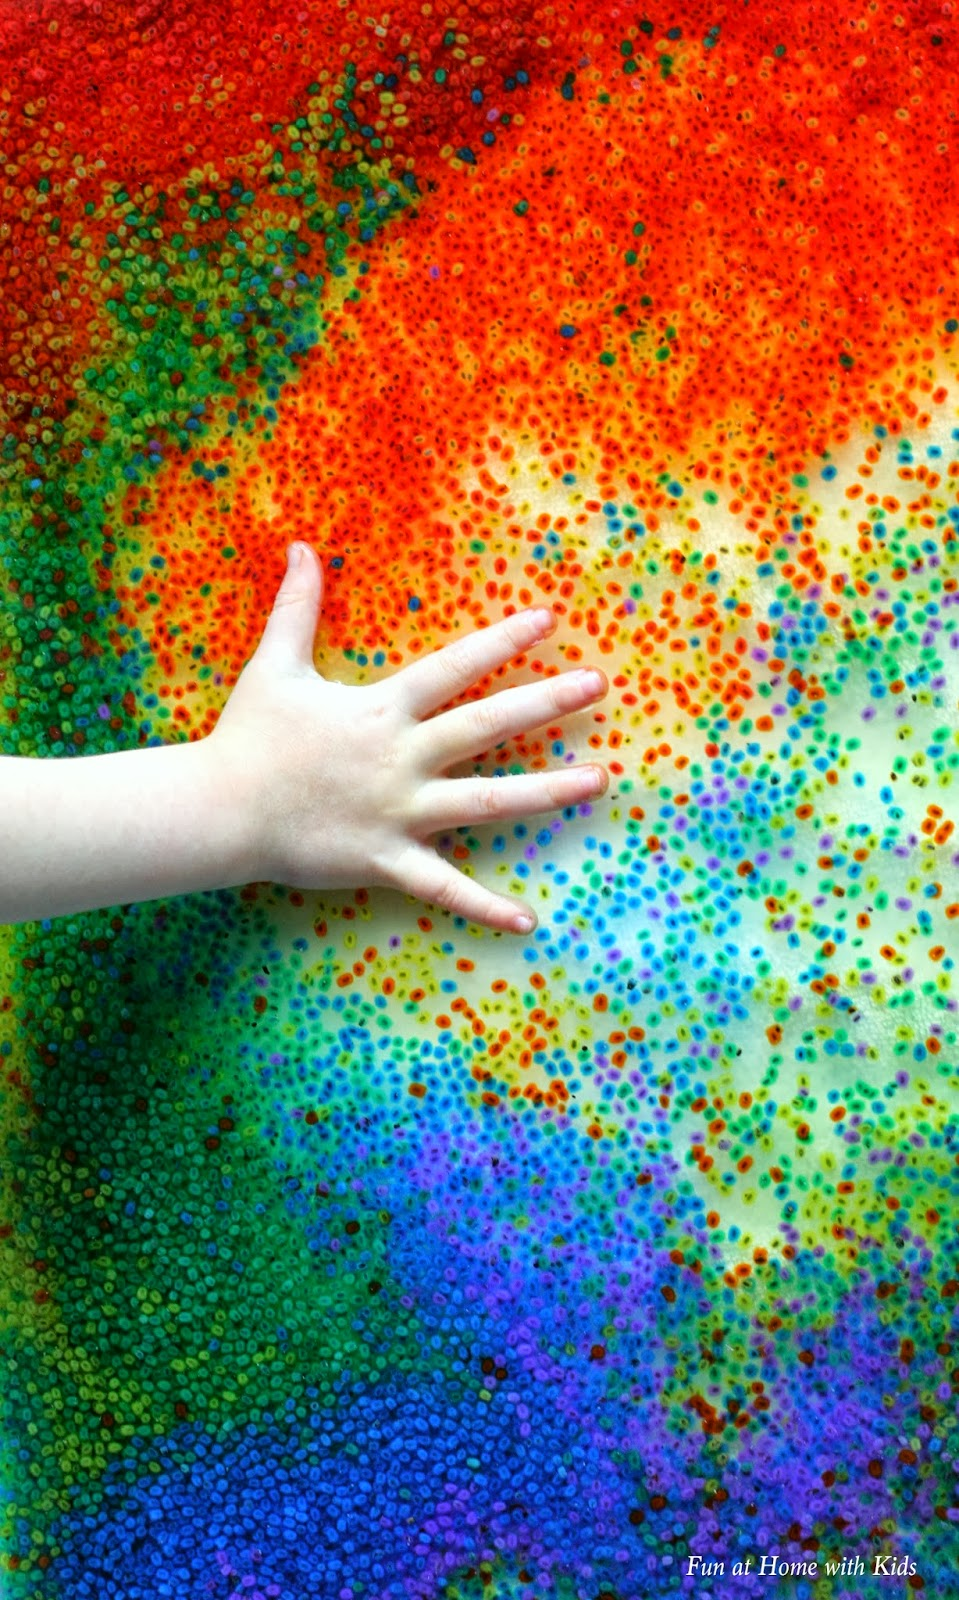 safe edible mini water beads fun at home with kids.JPG